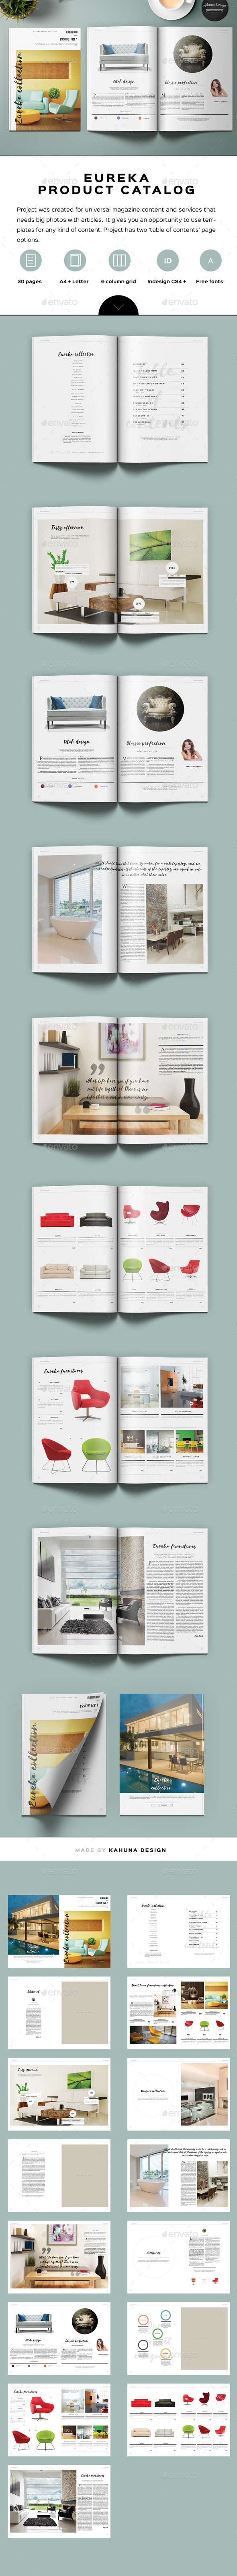 Eureka Product Catalog Design - Catalogs Brochures